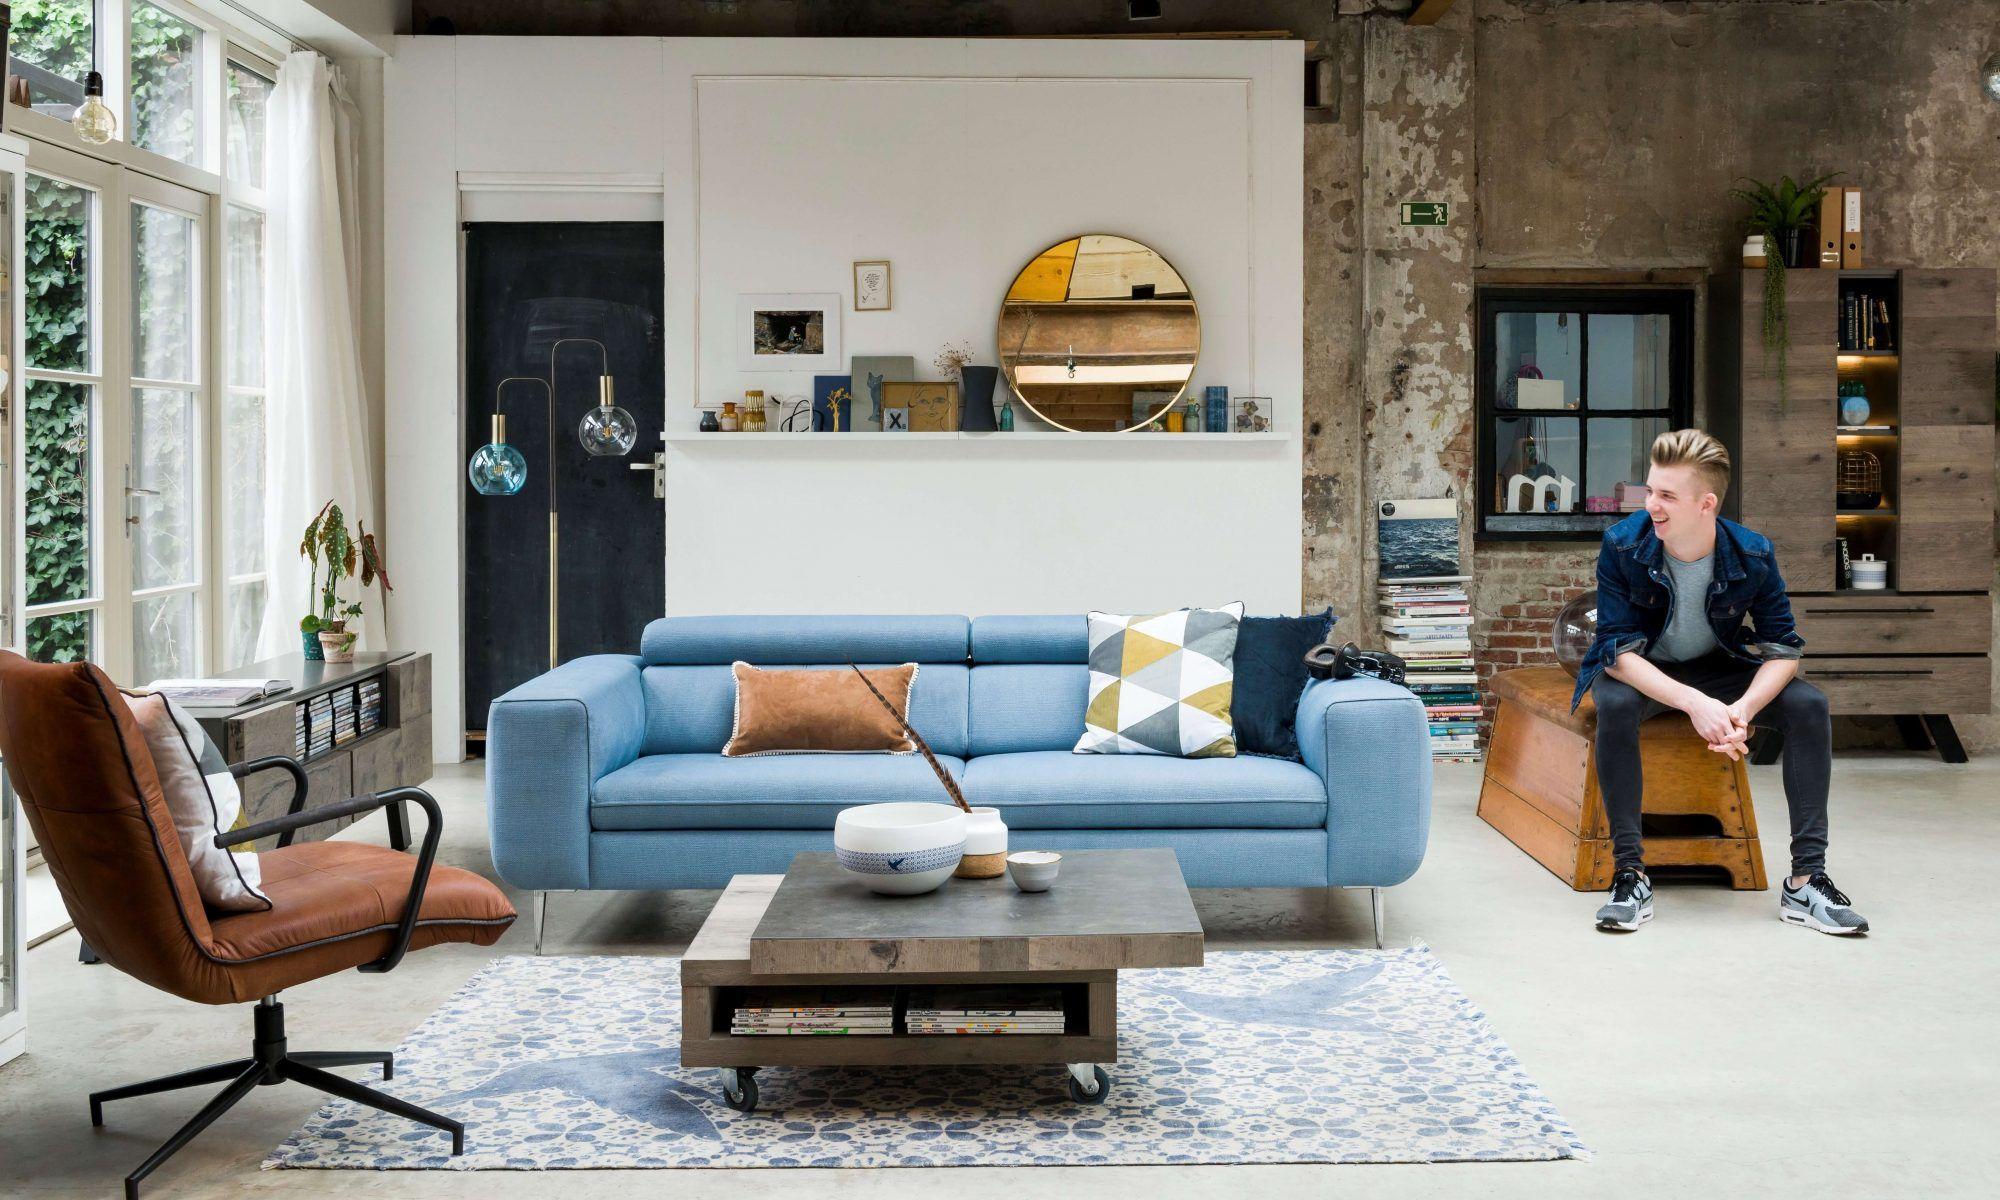 Xooon Le Design Accessible Et Personnalisable Abitare Living Home Decor Design Furniture